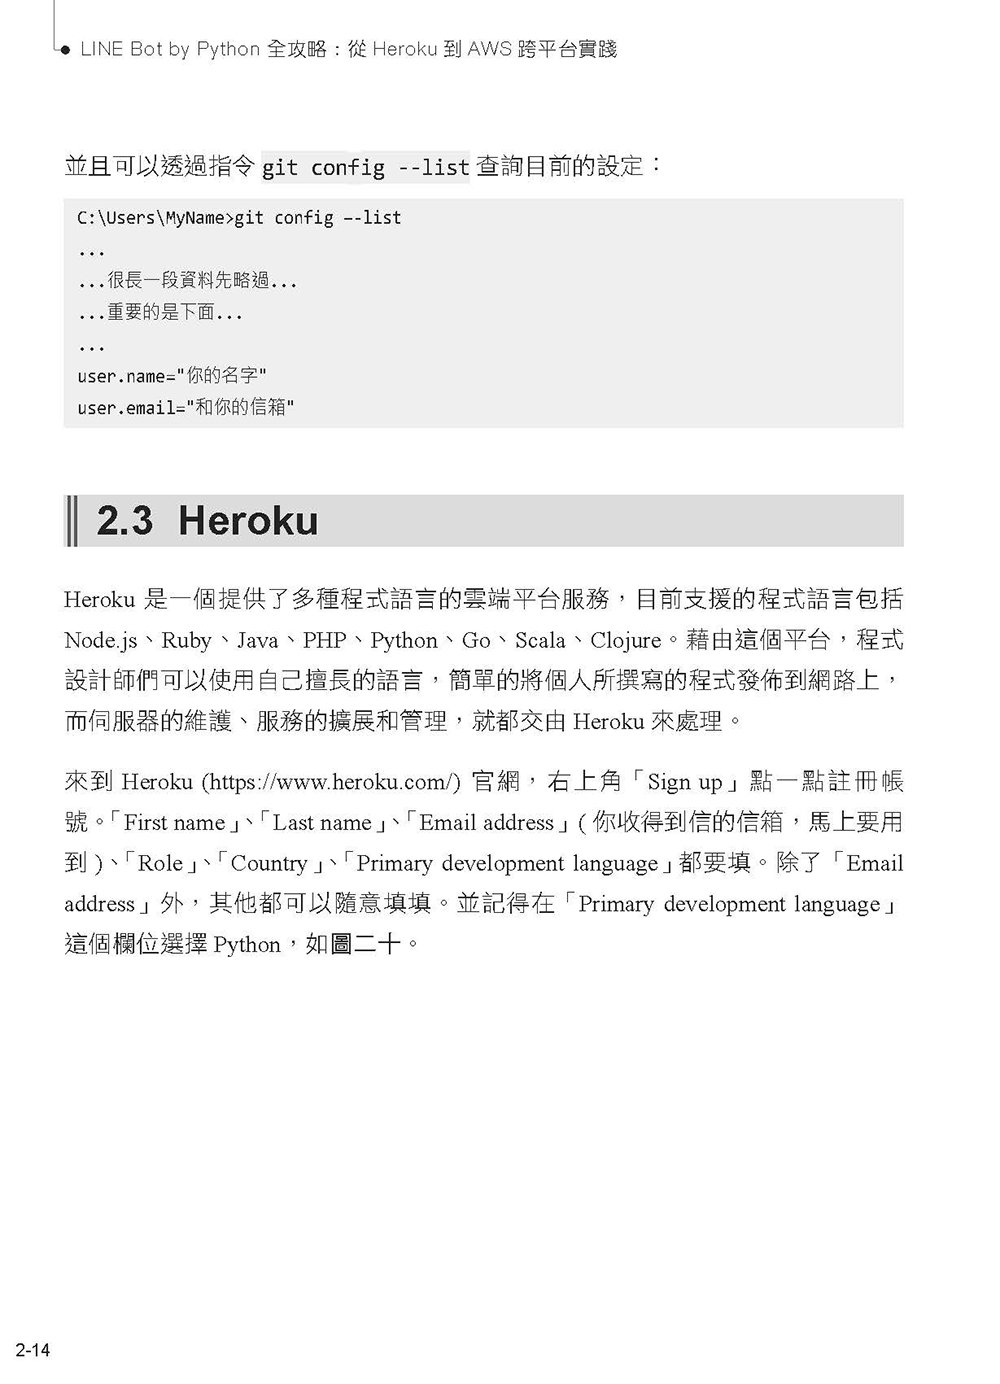 LINE Bot by Python 全攻略:從 Heroku 到 AWS 跨平台實踐 (iT邦幫忙鐵人賽系列書)-preview-14